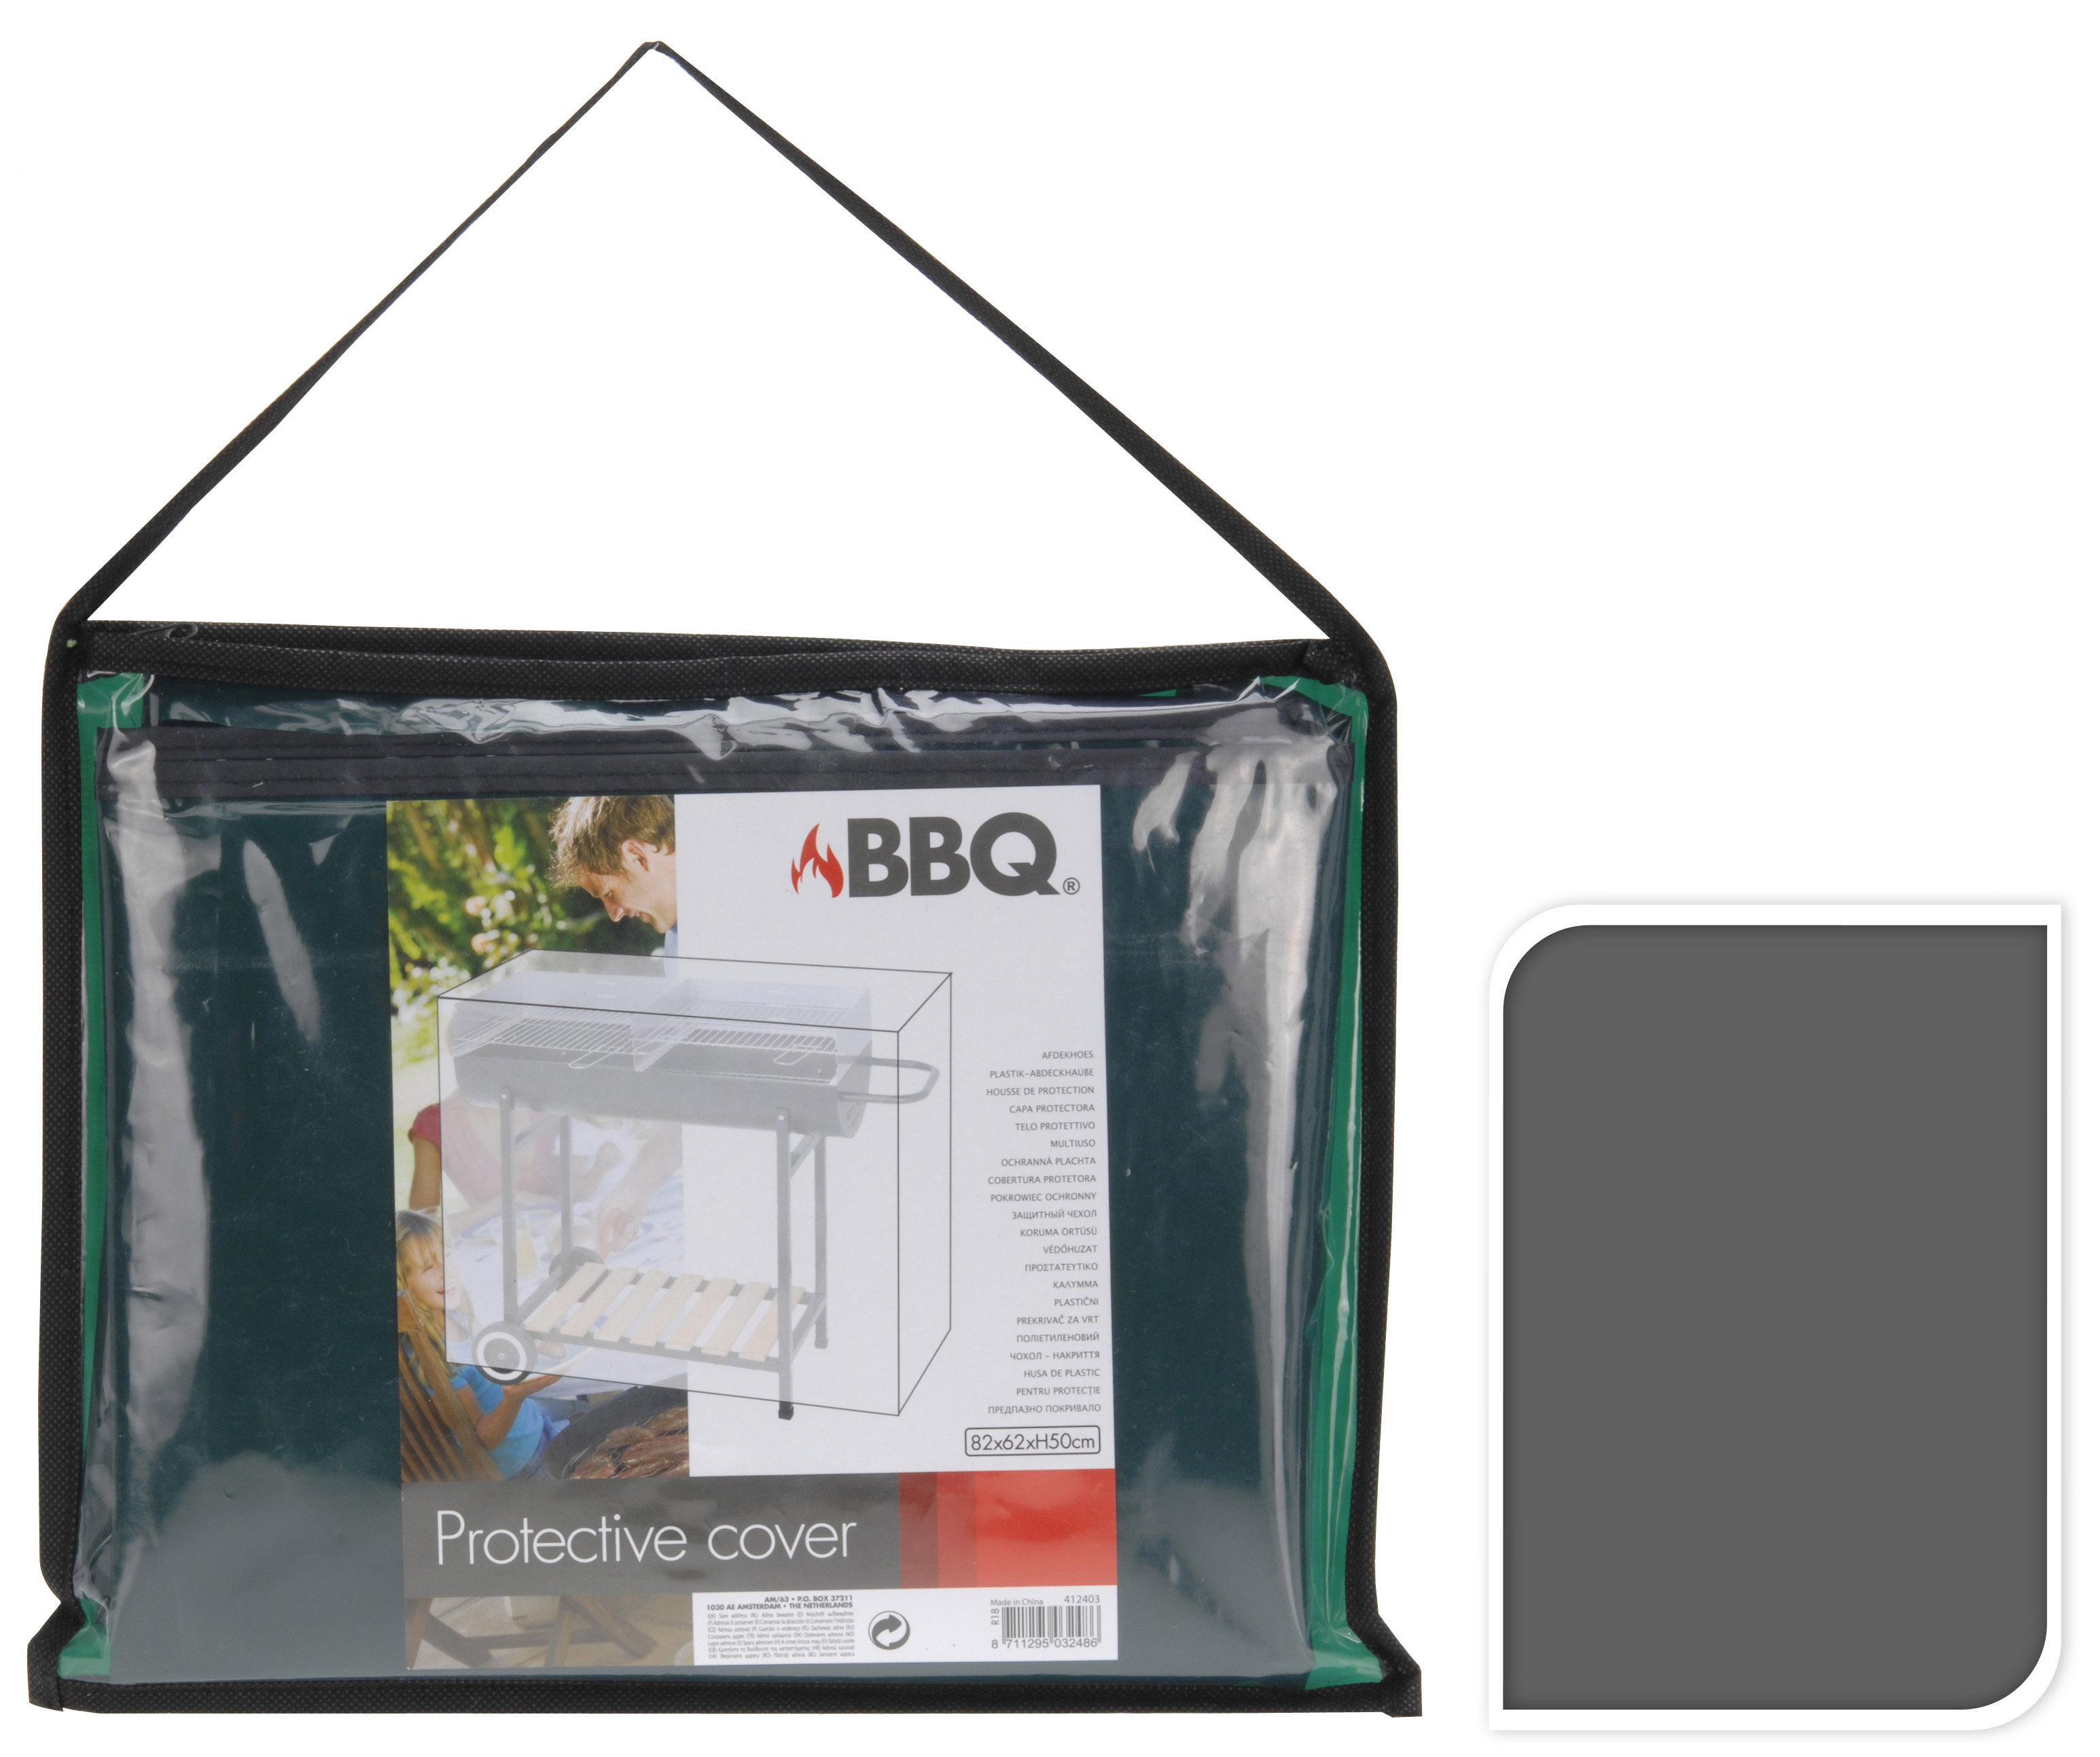 BBQ afdekhoes 82x62x50 cm